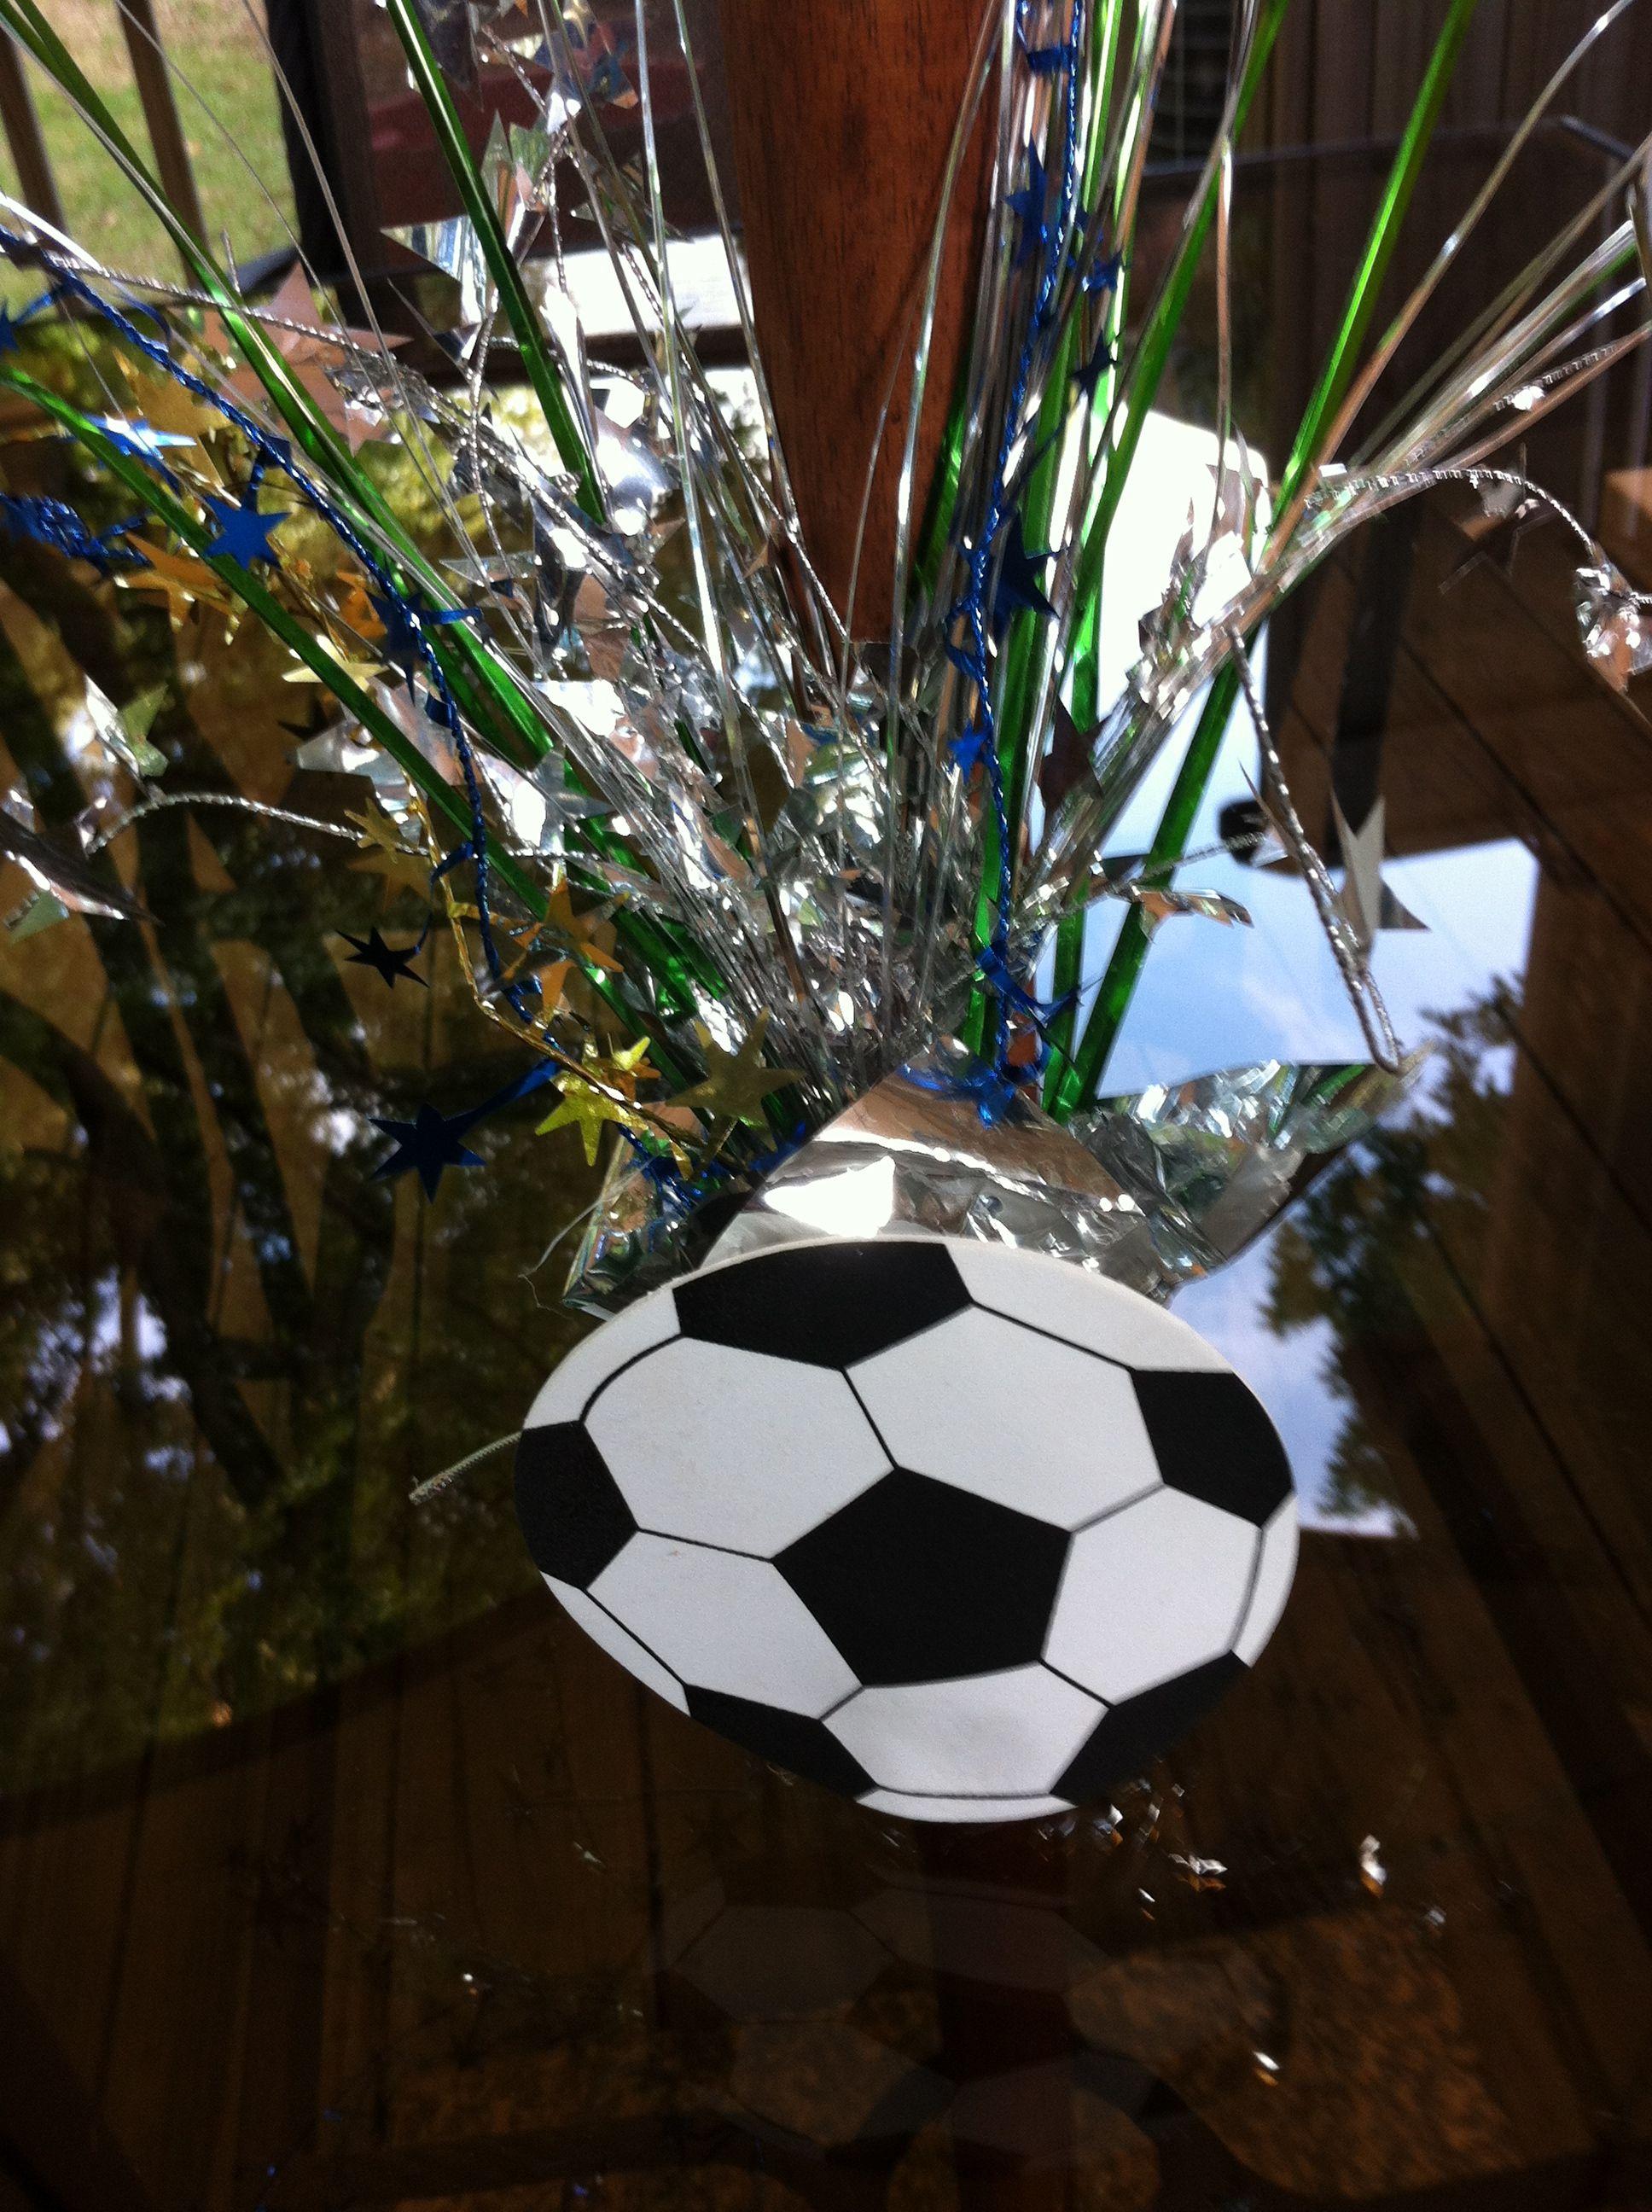 Sports Table Lobby Decorations Hobby